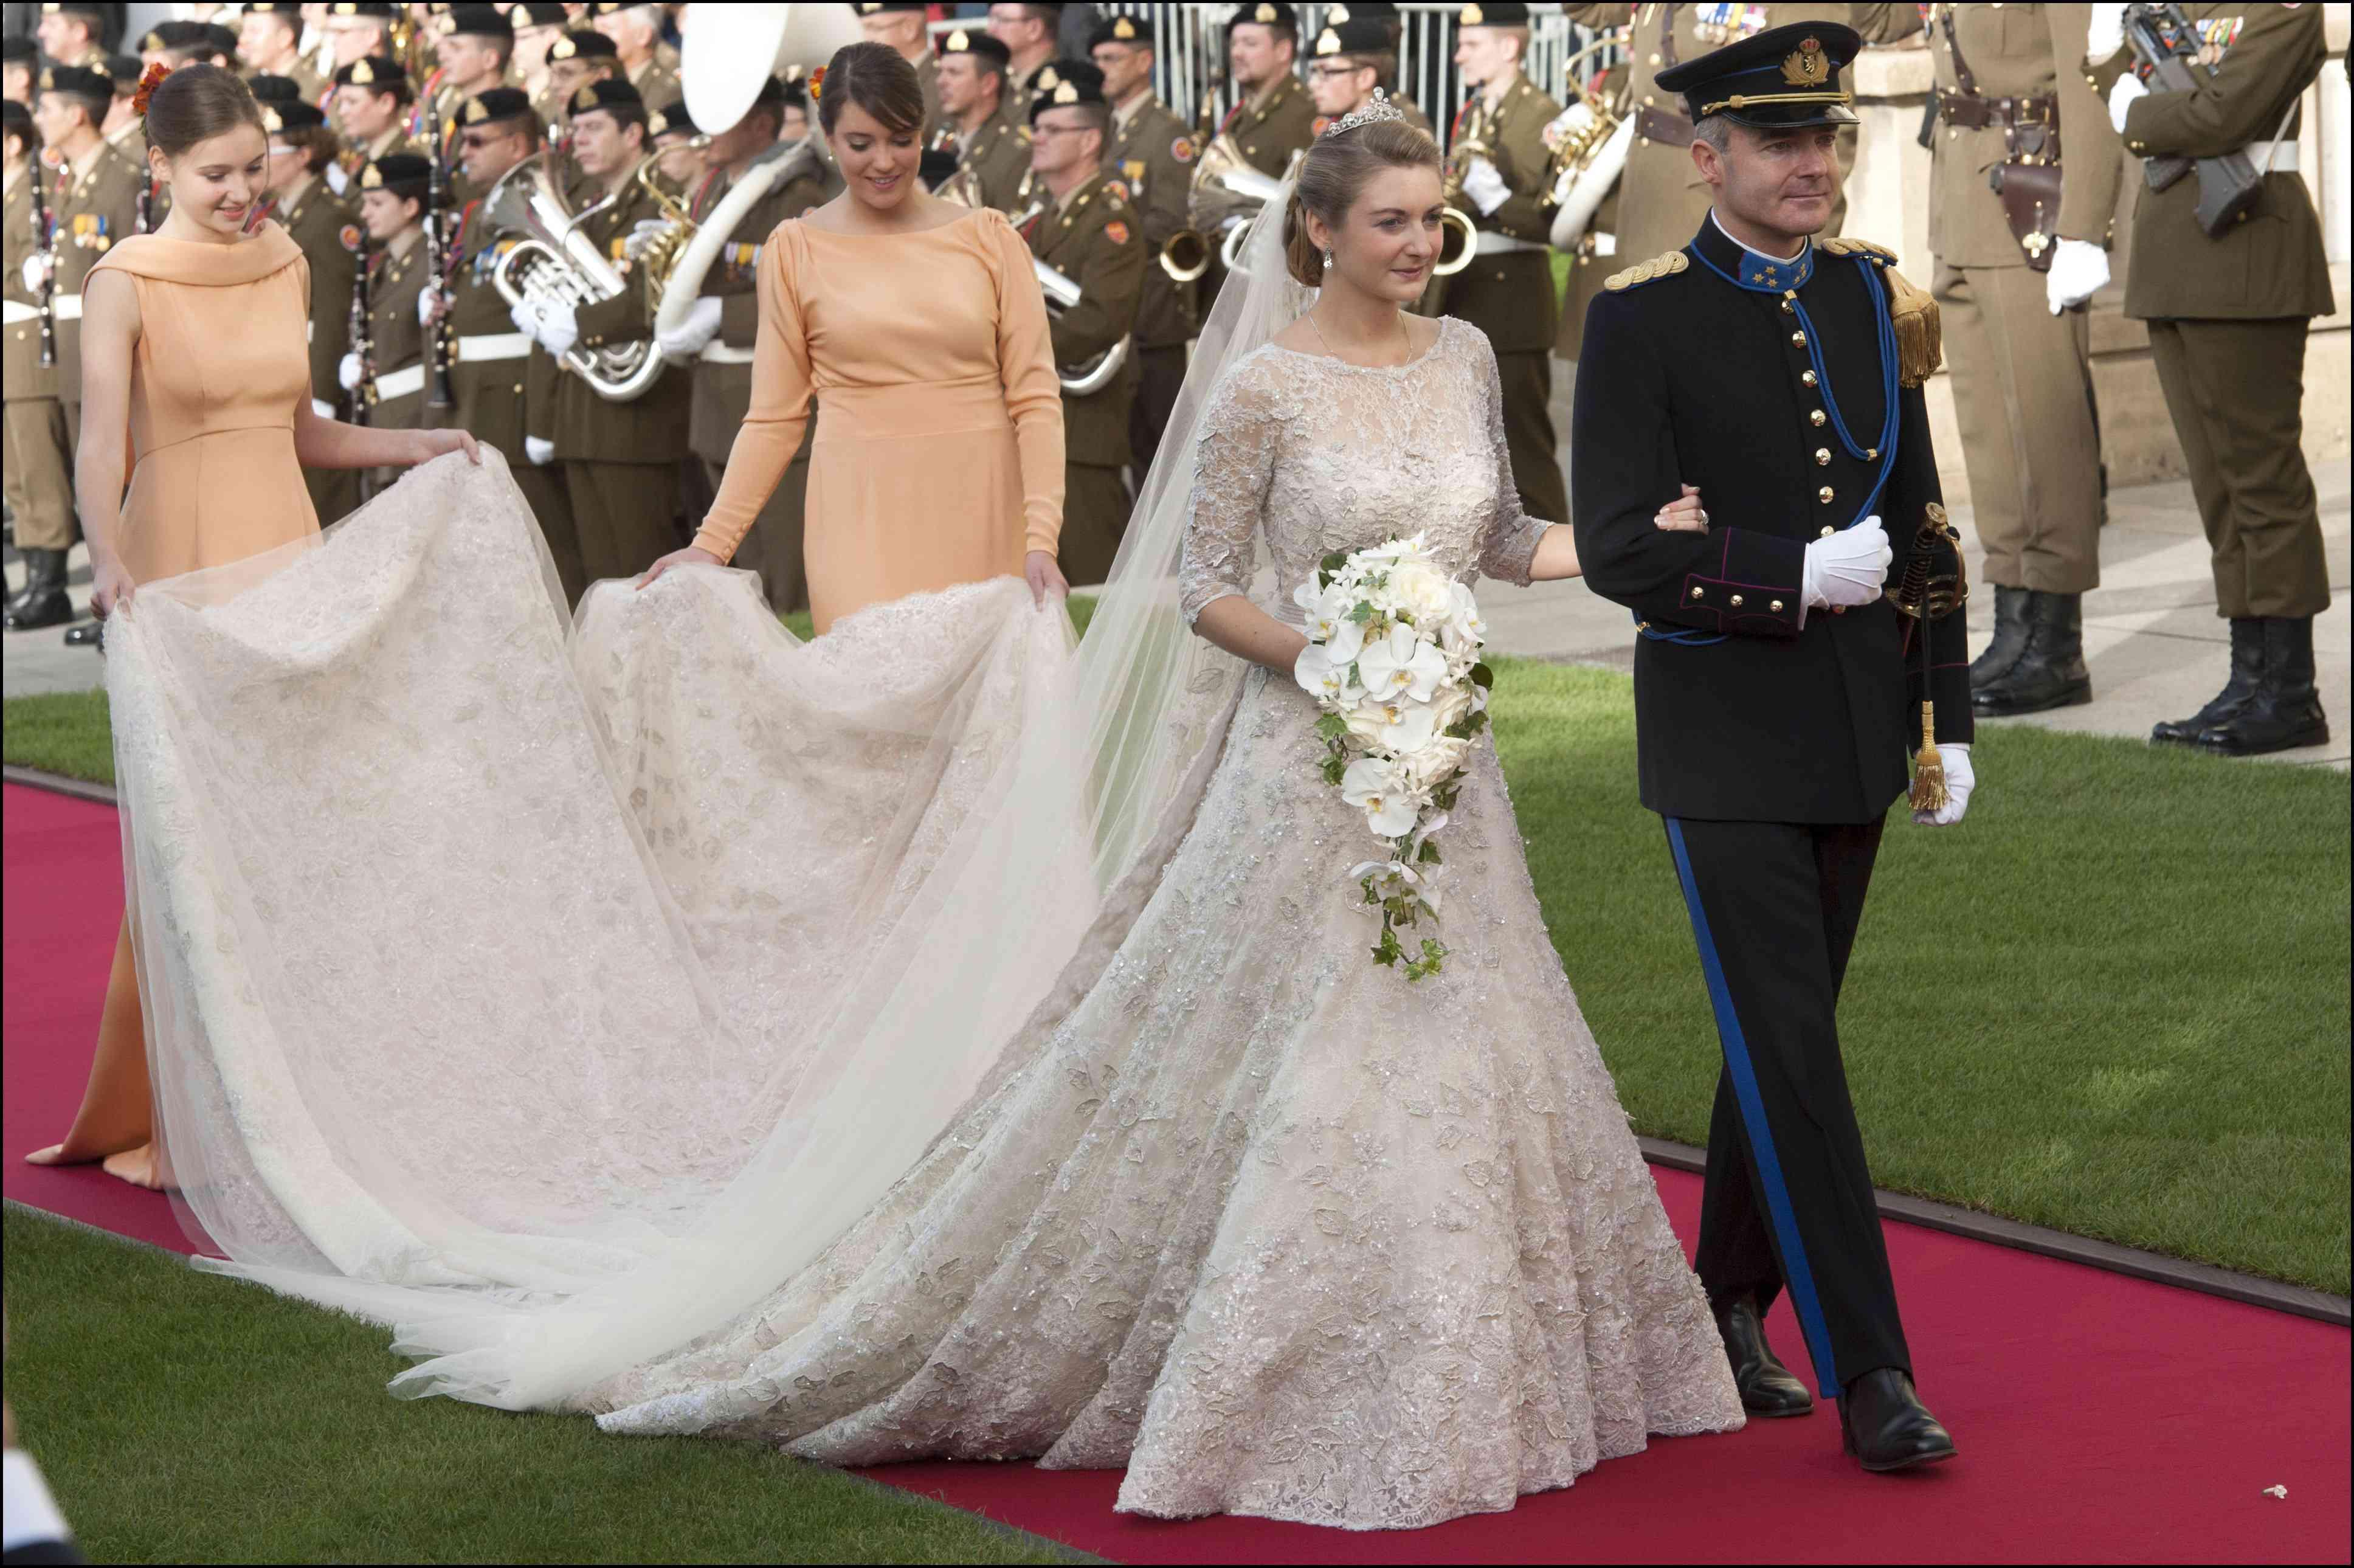 Stephanie de Lanno on her wedding day